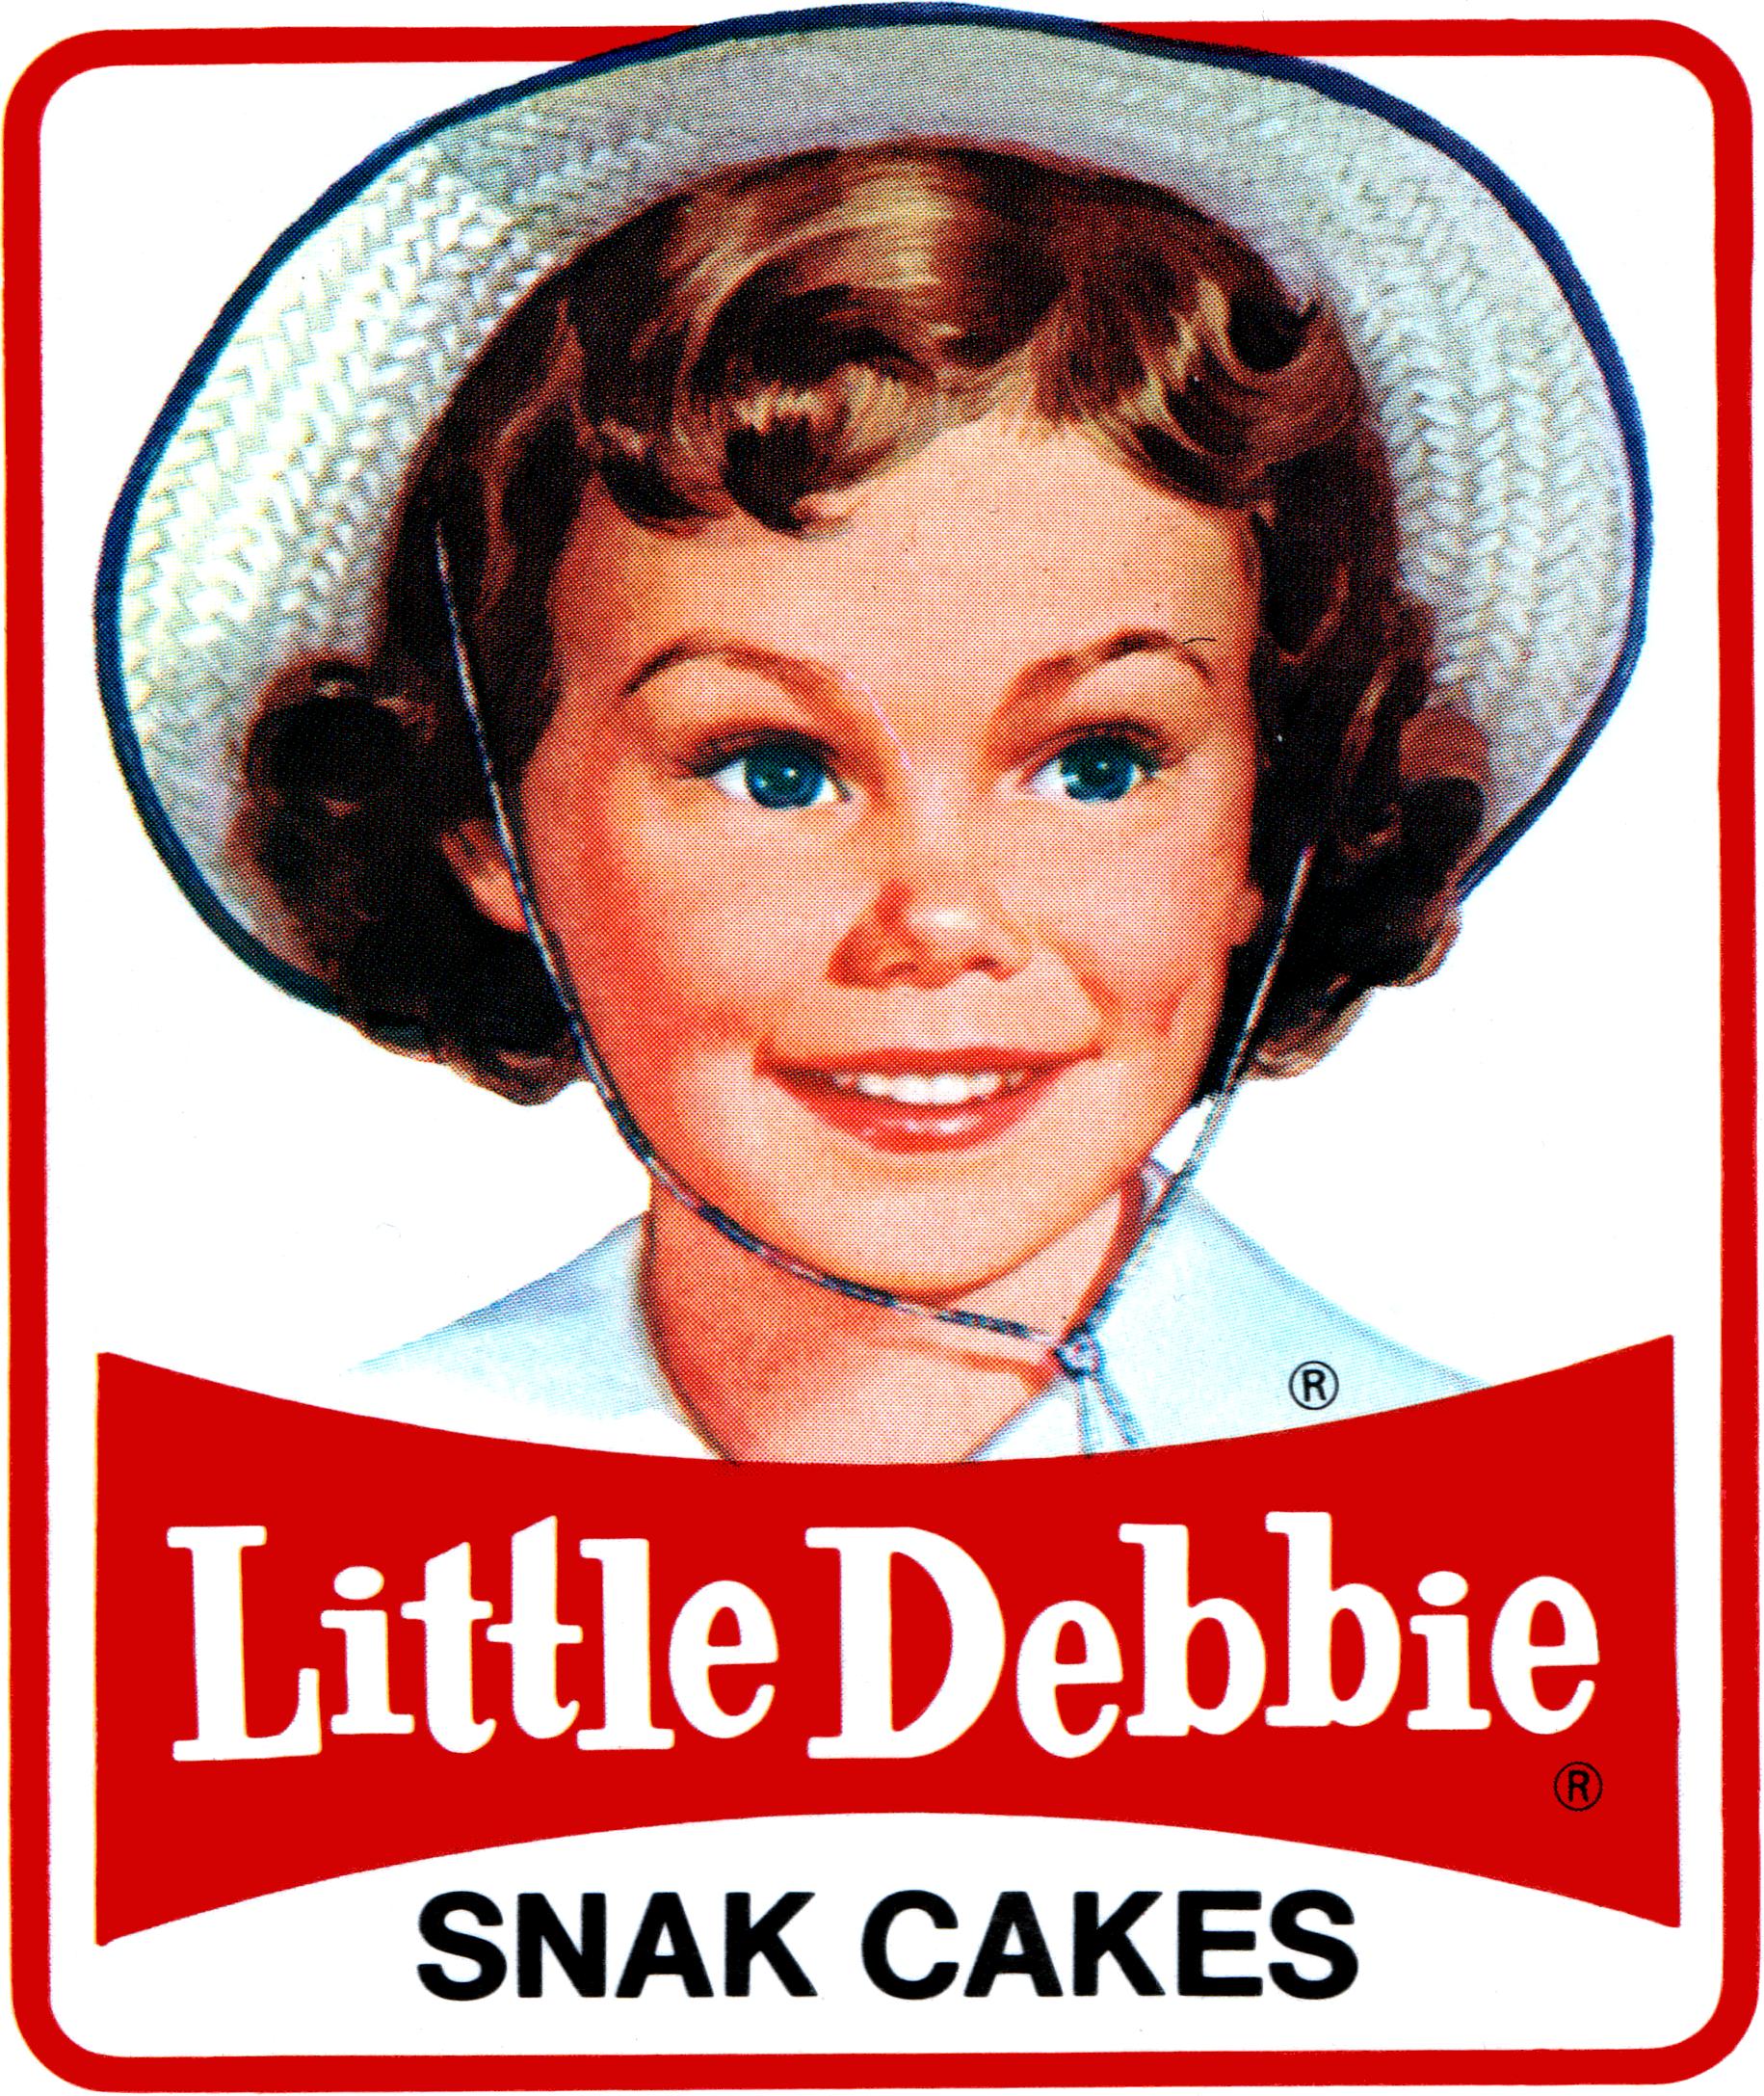 History Of Little Debbie Cakes